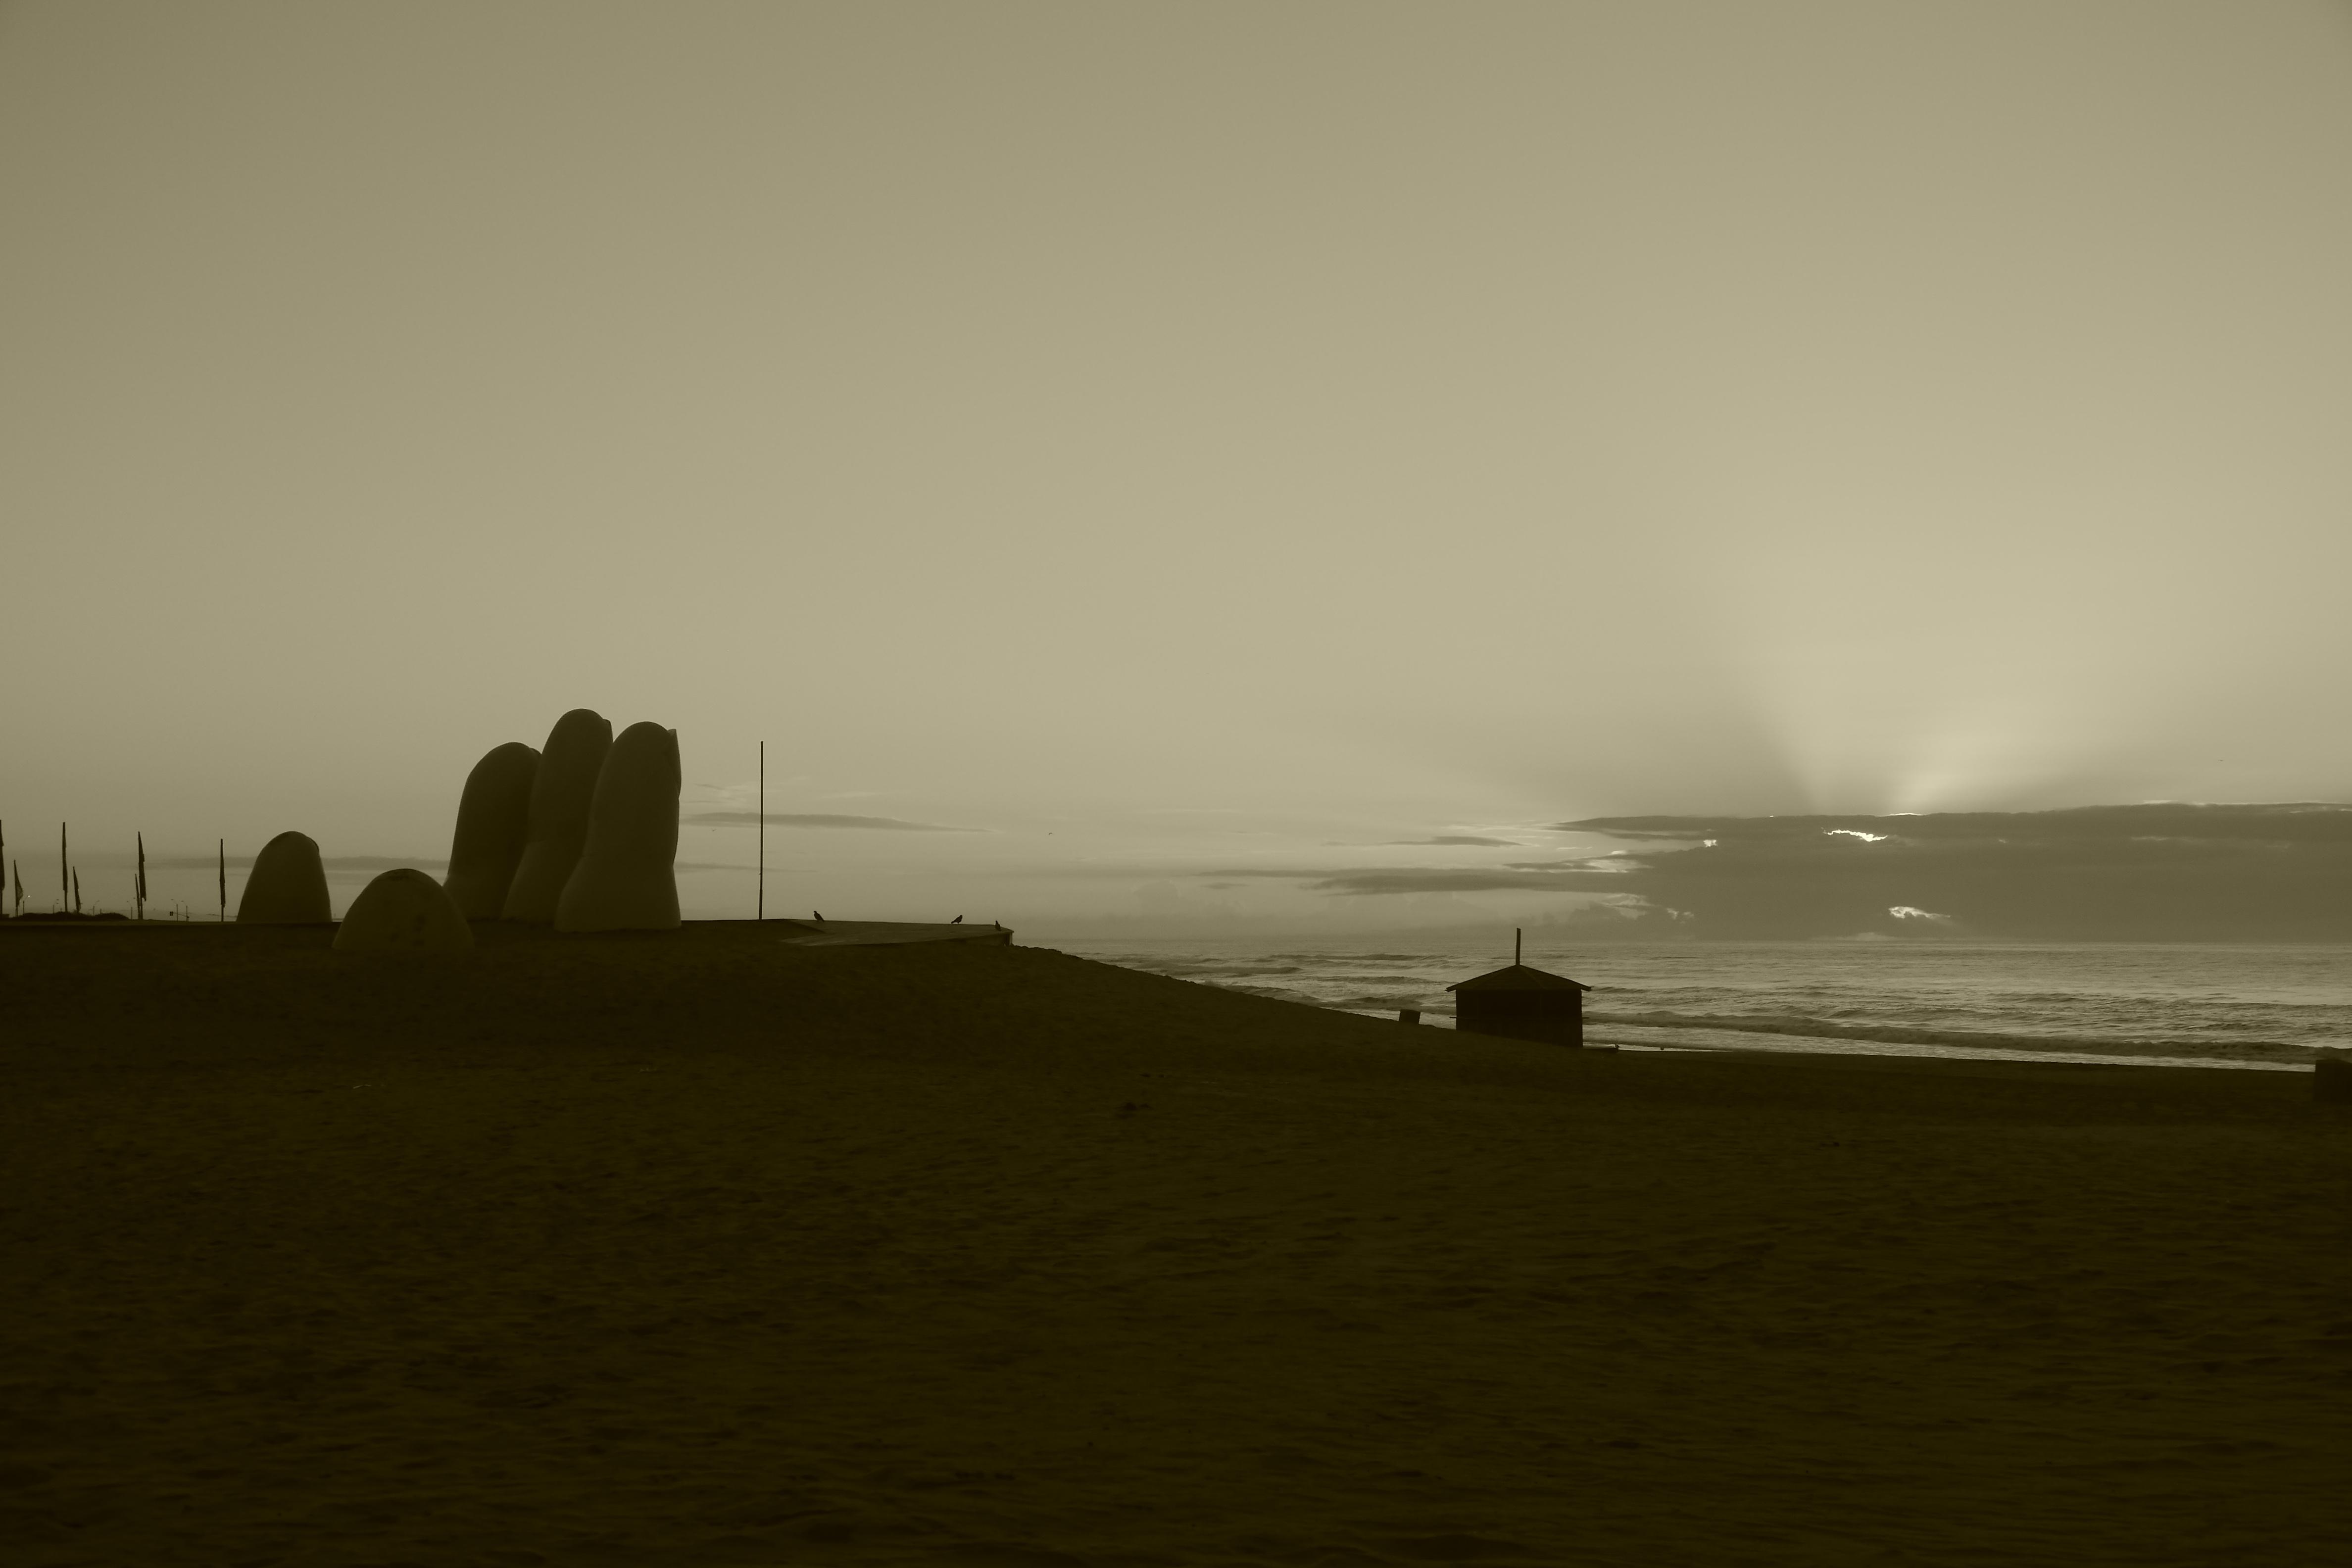 018 0404 Punta del Este - Punta Ballena 8jpeg